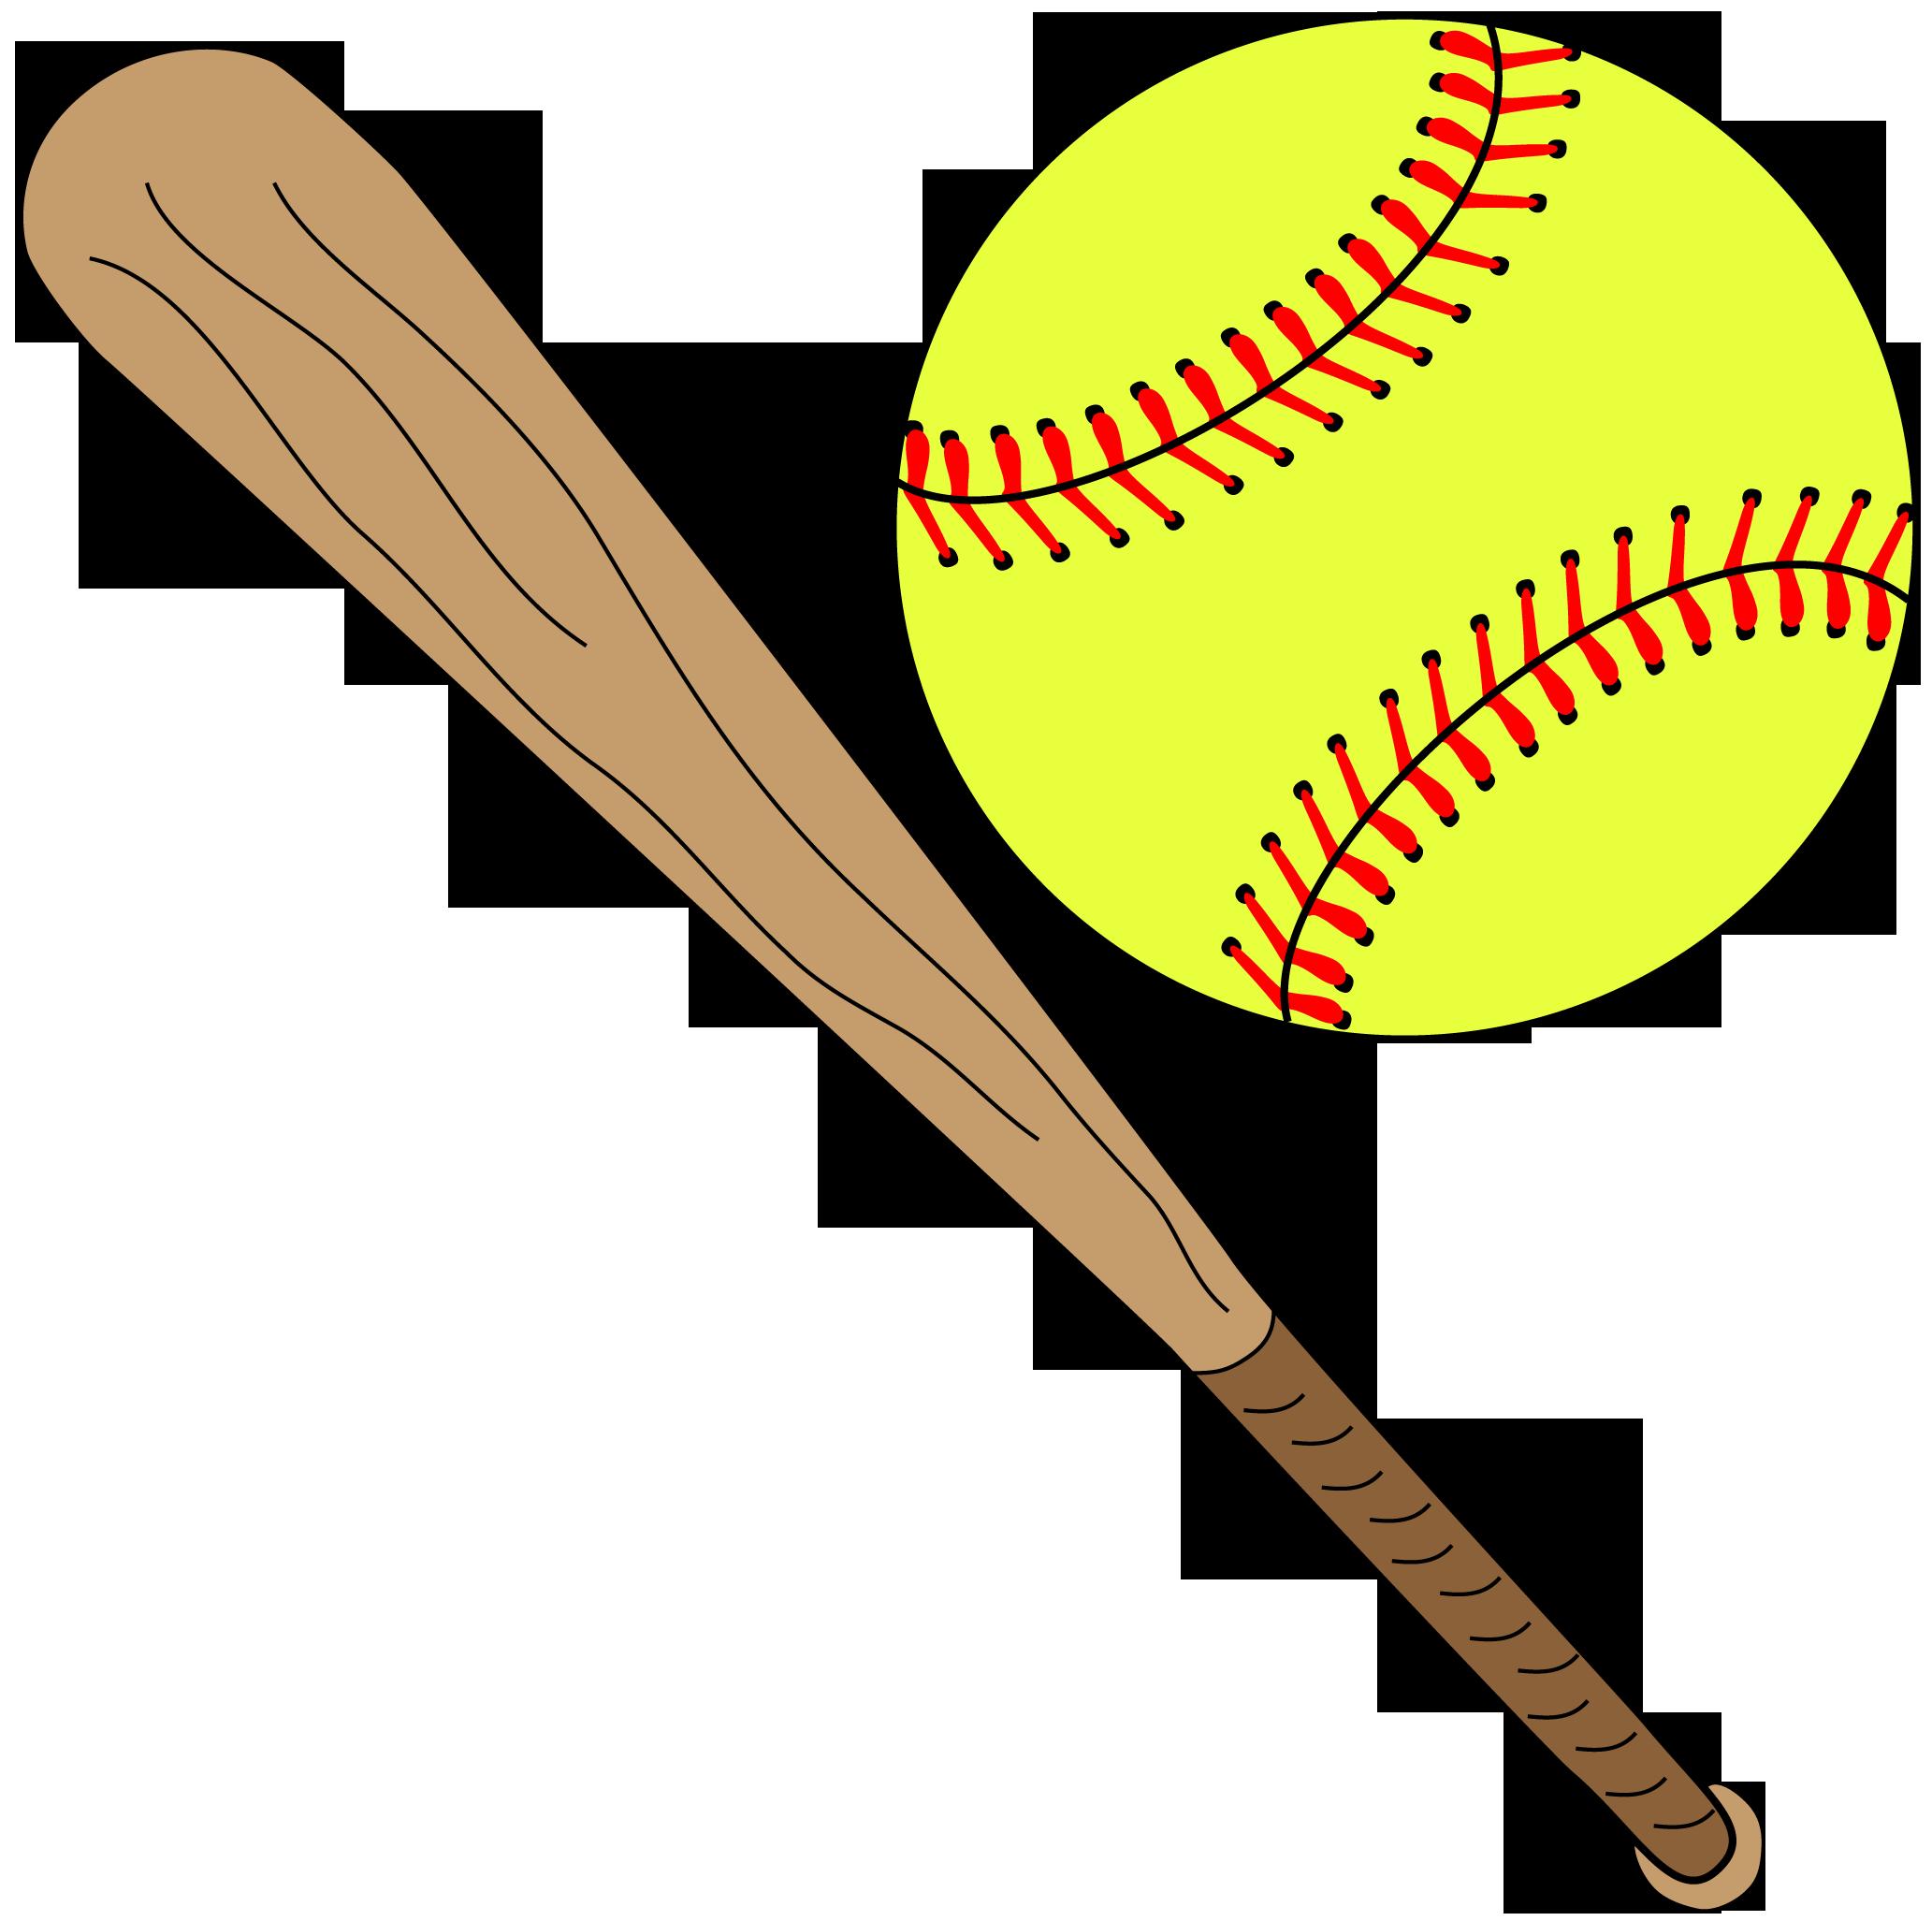 2065x2053 Softball Images (44)